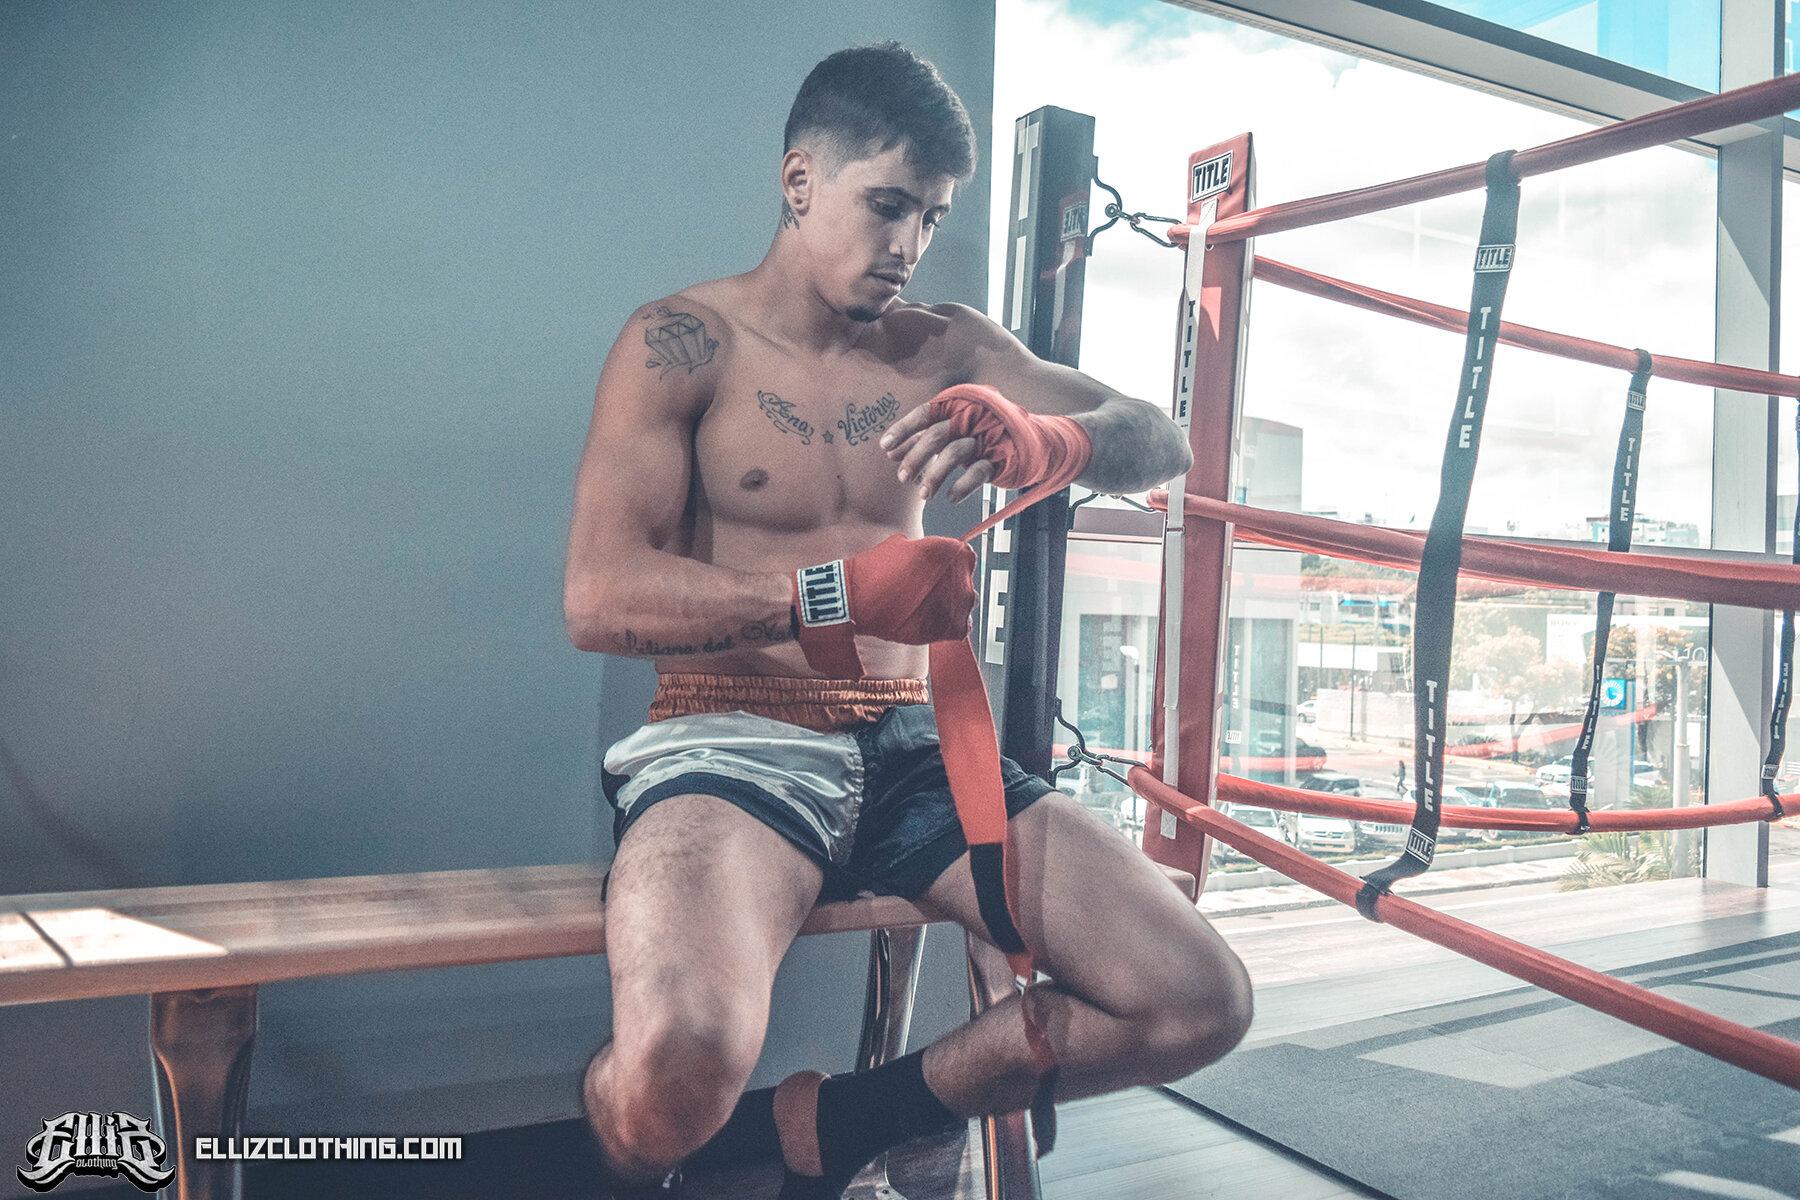 Braian Leiva Elliz Clothing MMA Photoshoot 06